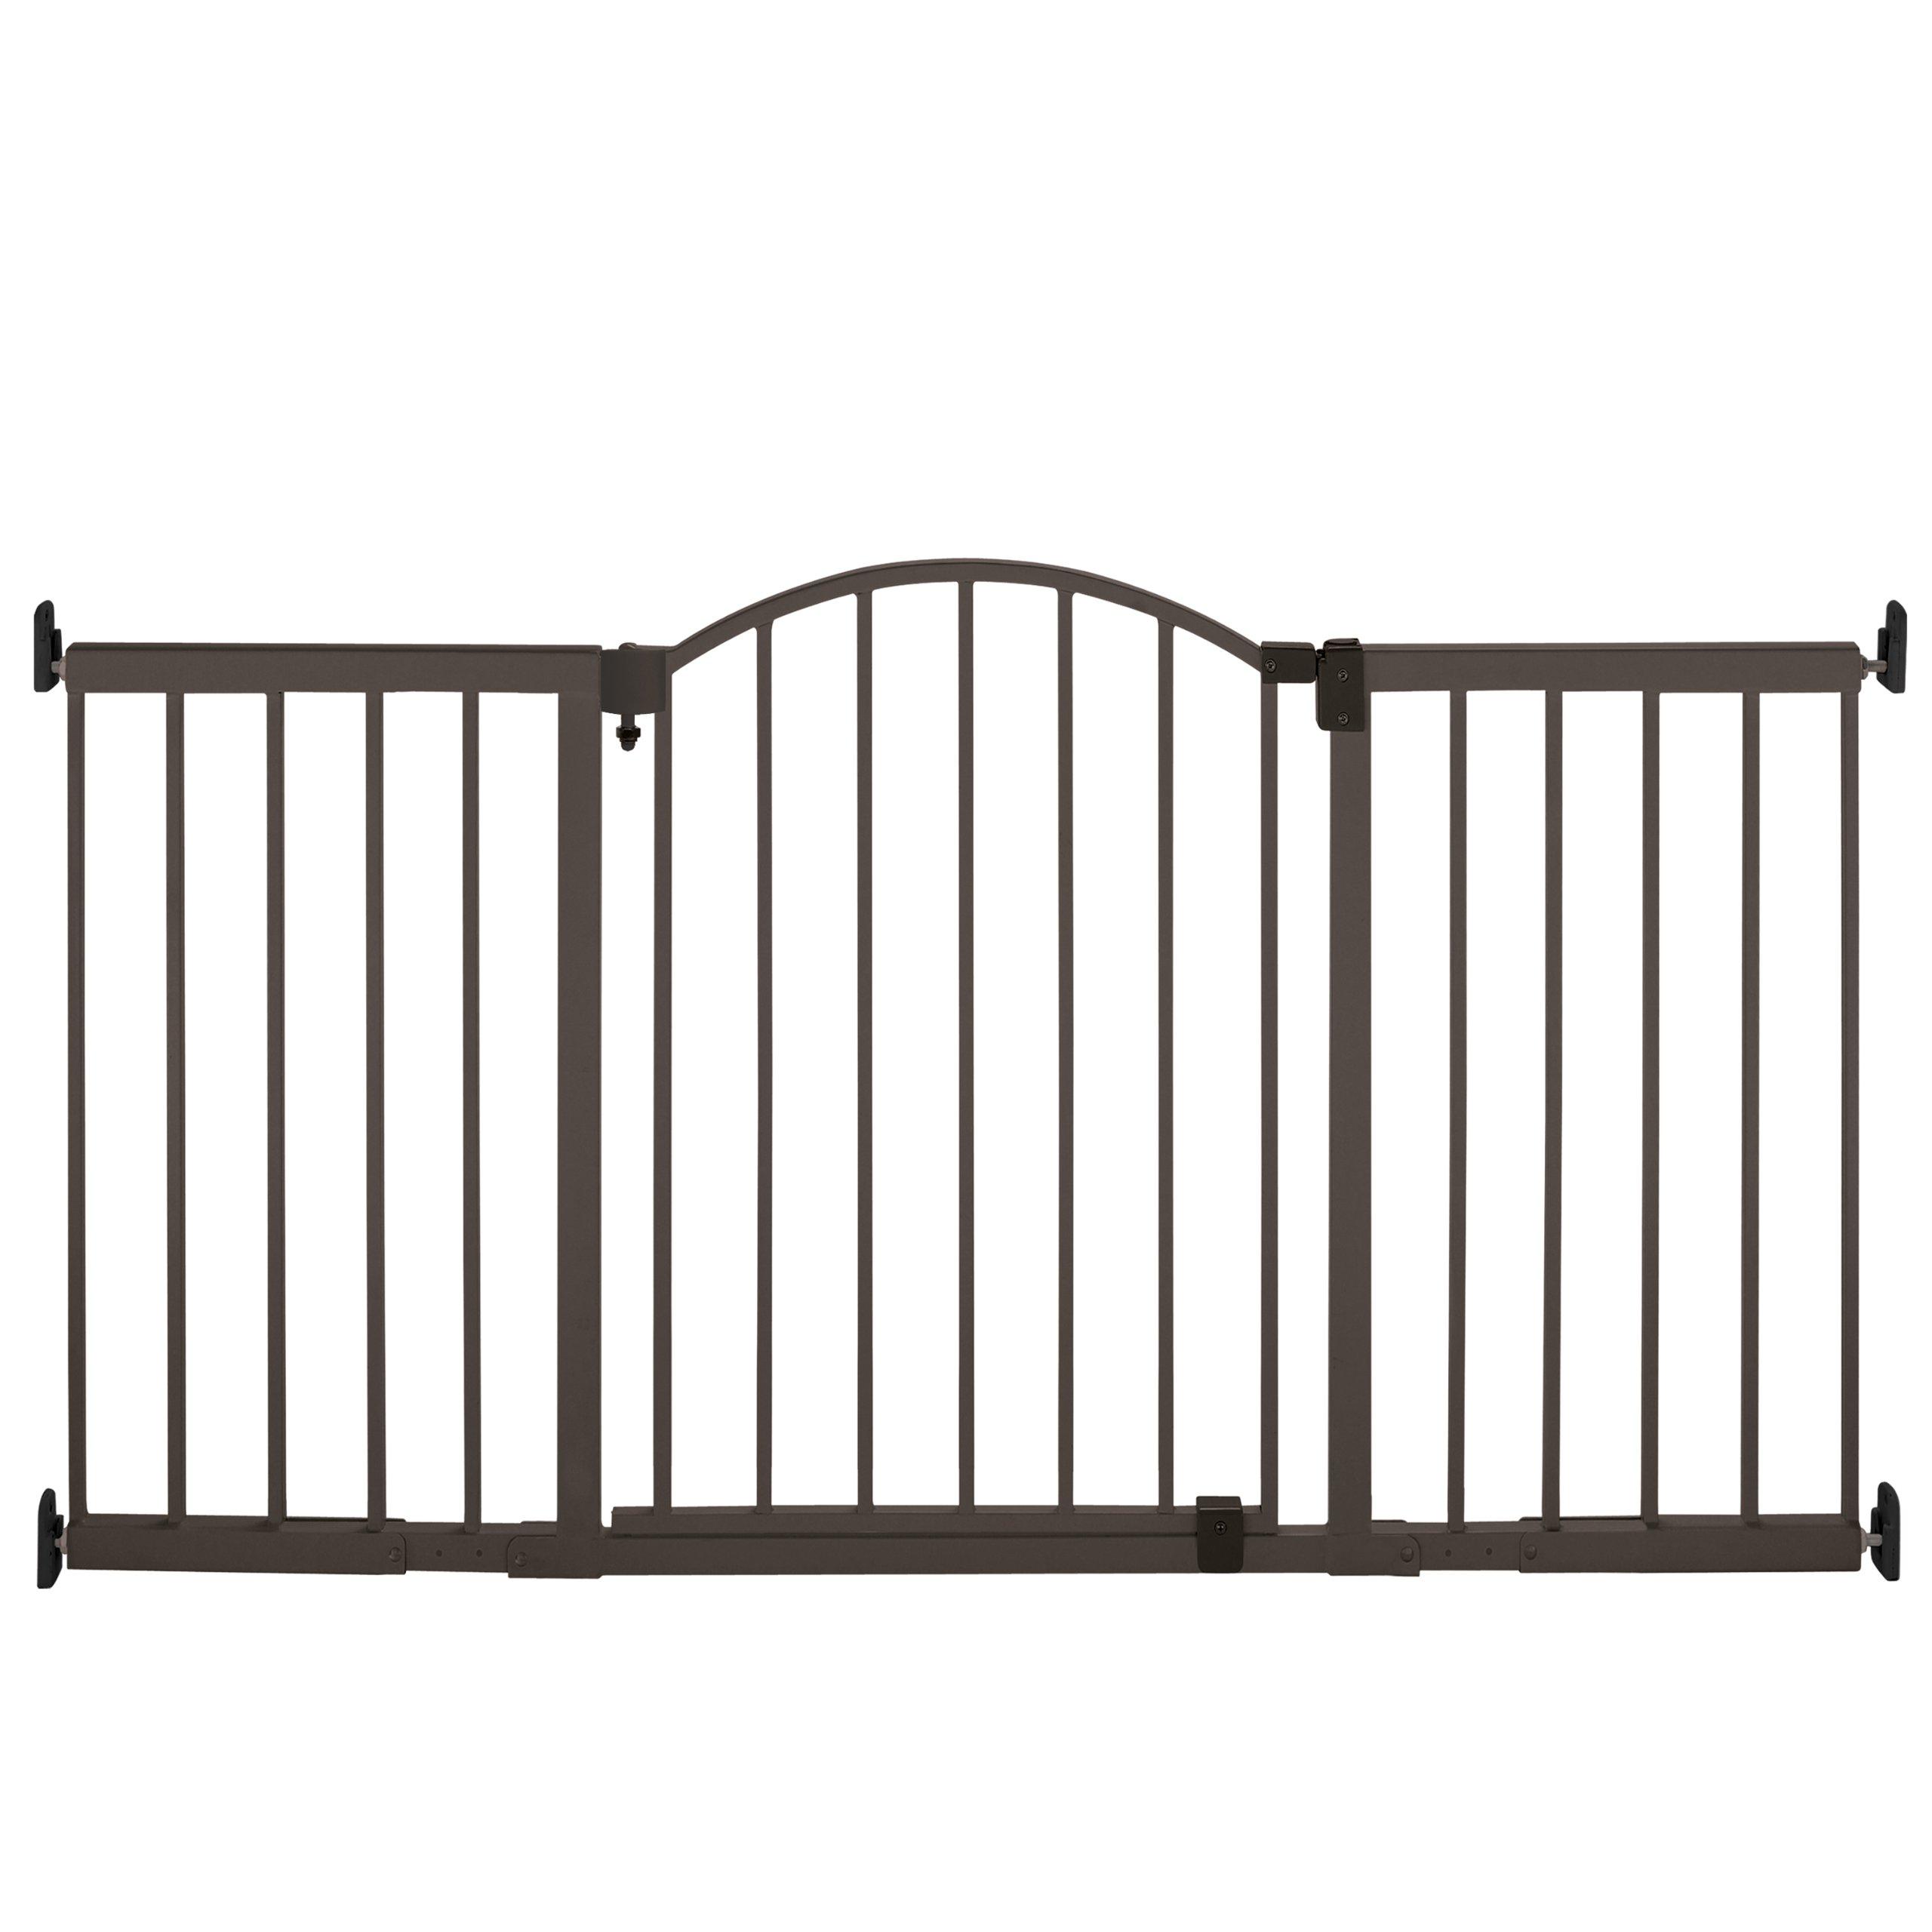 Summer Infant Metal Expansion Gate 6 Foot Wide Extra Tall Walk-Thru Bronze